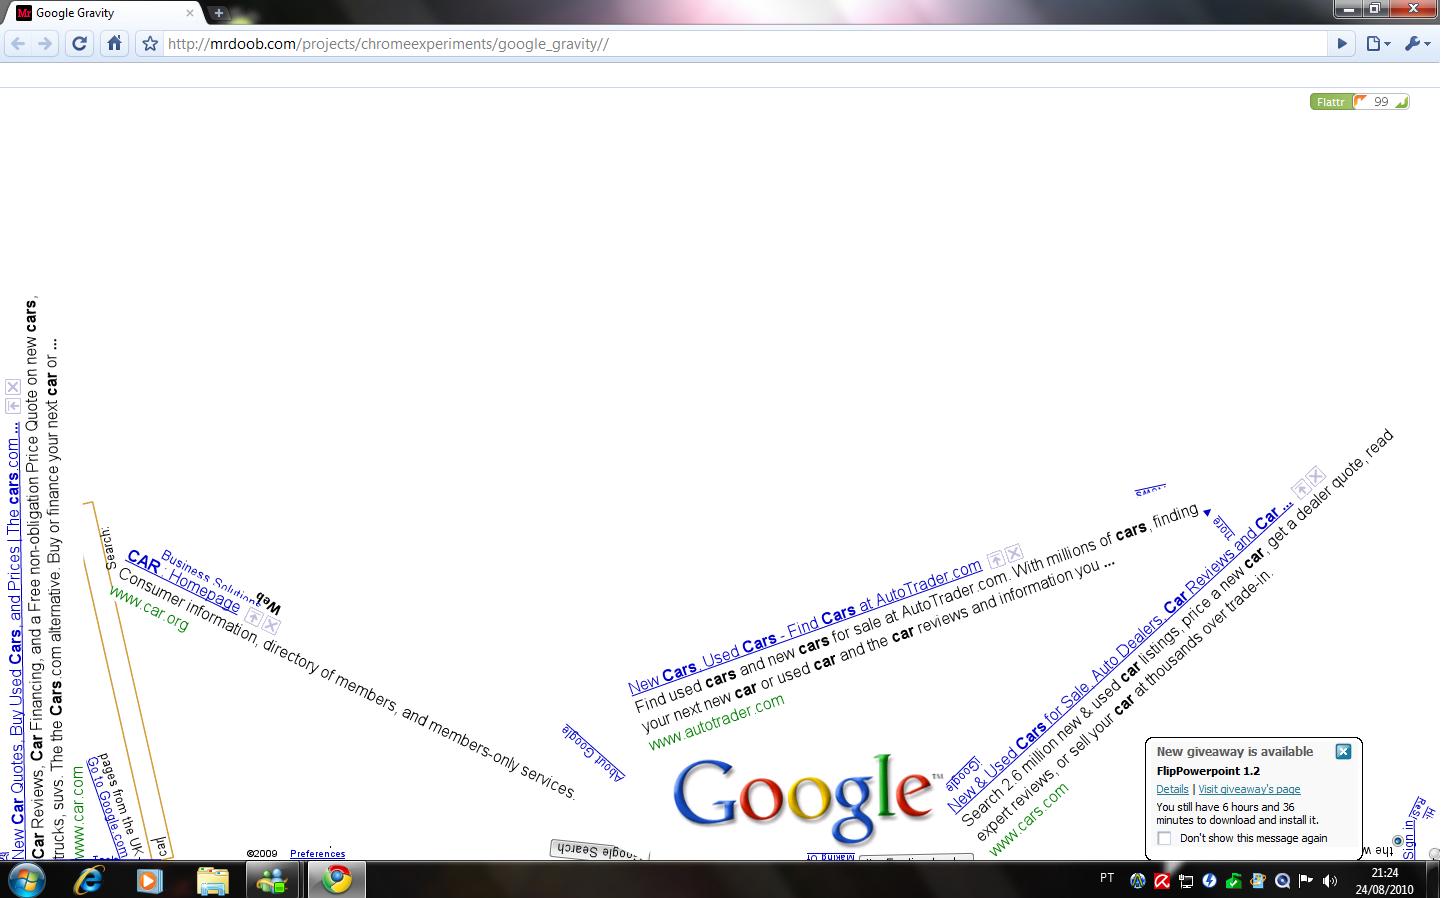 Google bubbles mr doob yaelp search google bubbles mr doob web news